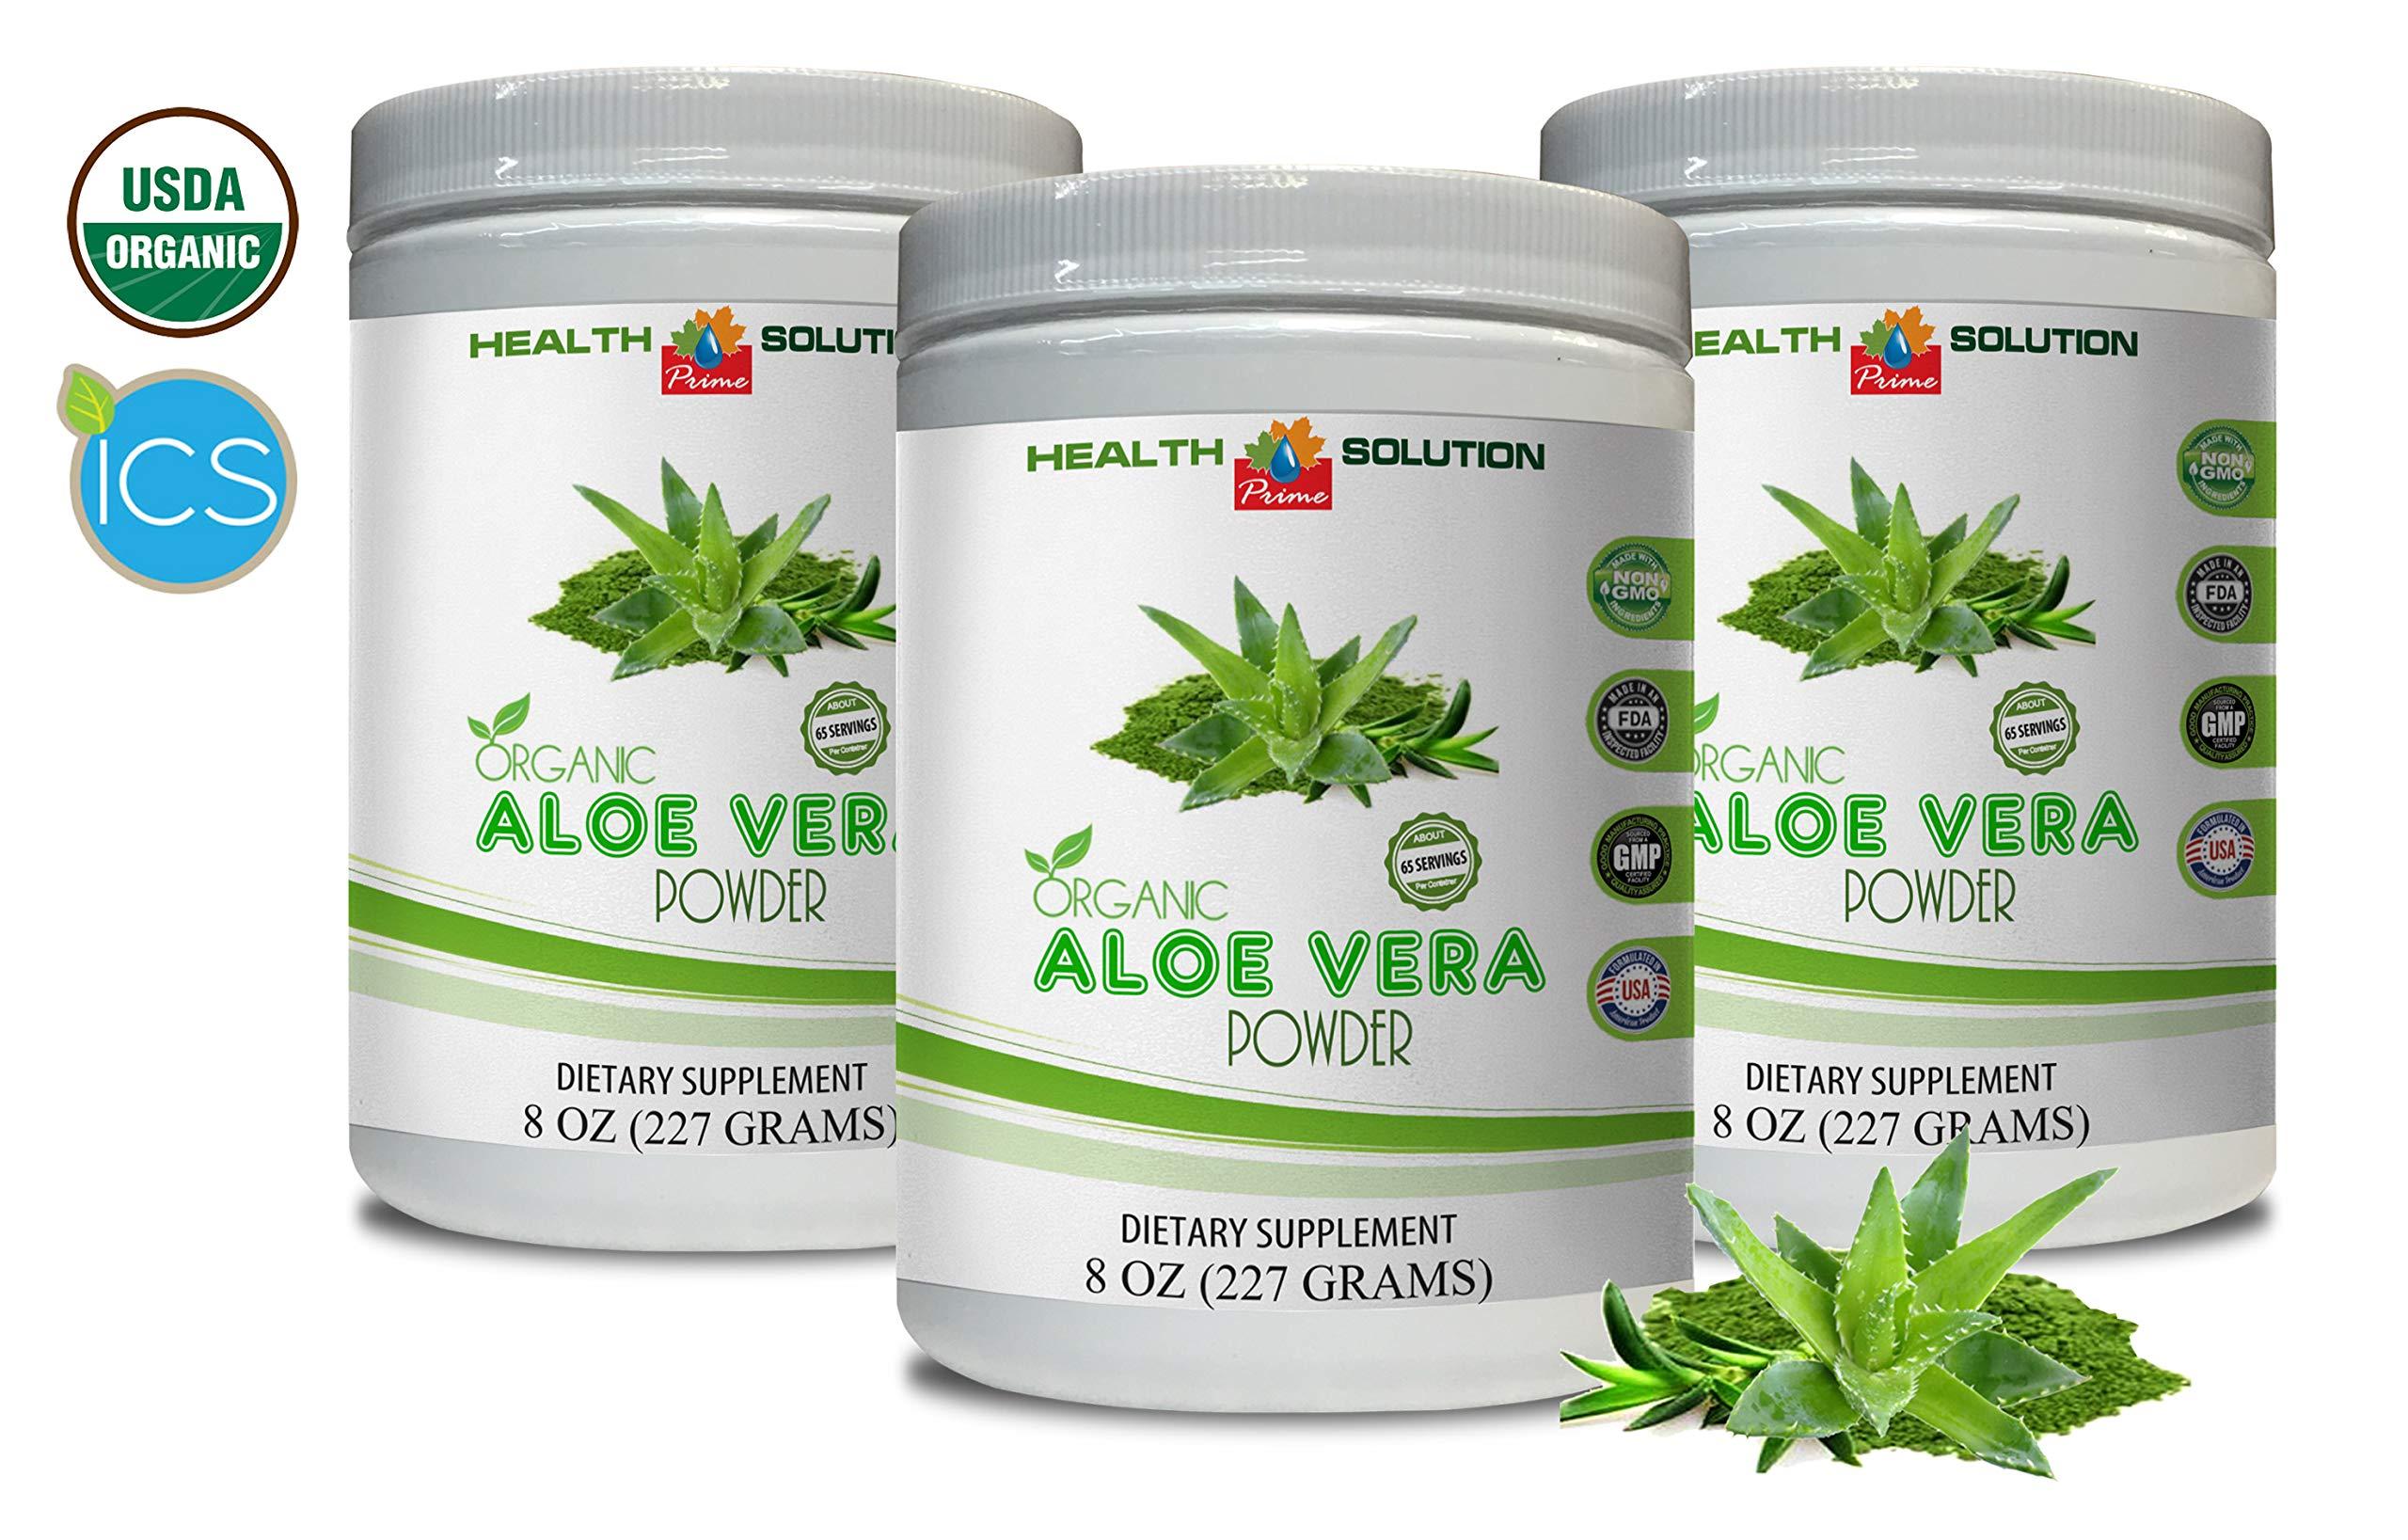 Organic Immunity Booster - Organic Aloe Vera Powder - Aloe Vera Gel Powder Organic - 3 Cans 24 OZ (195 Servings)